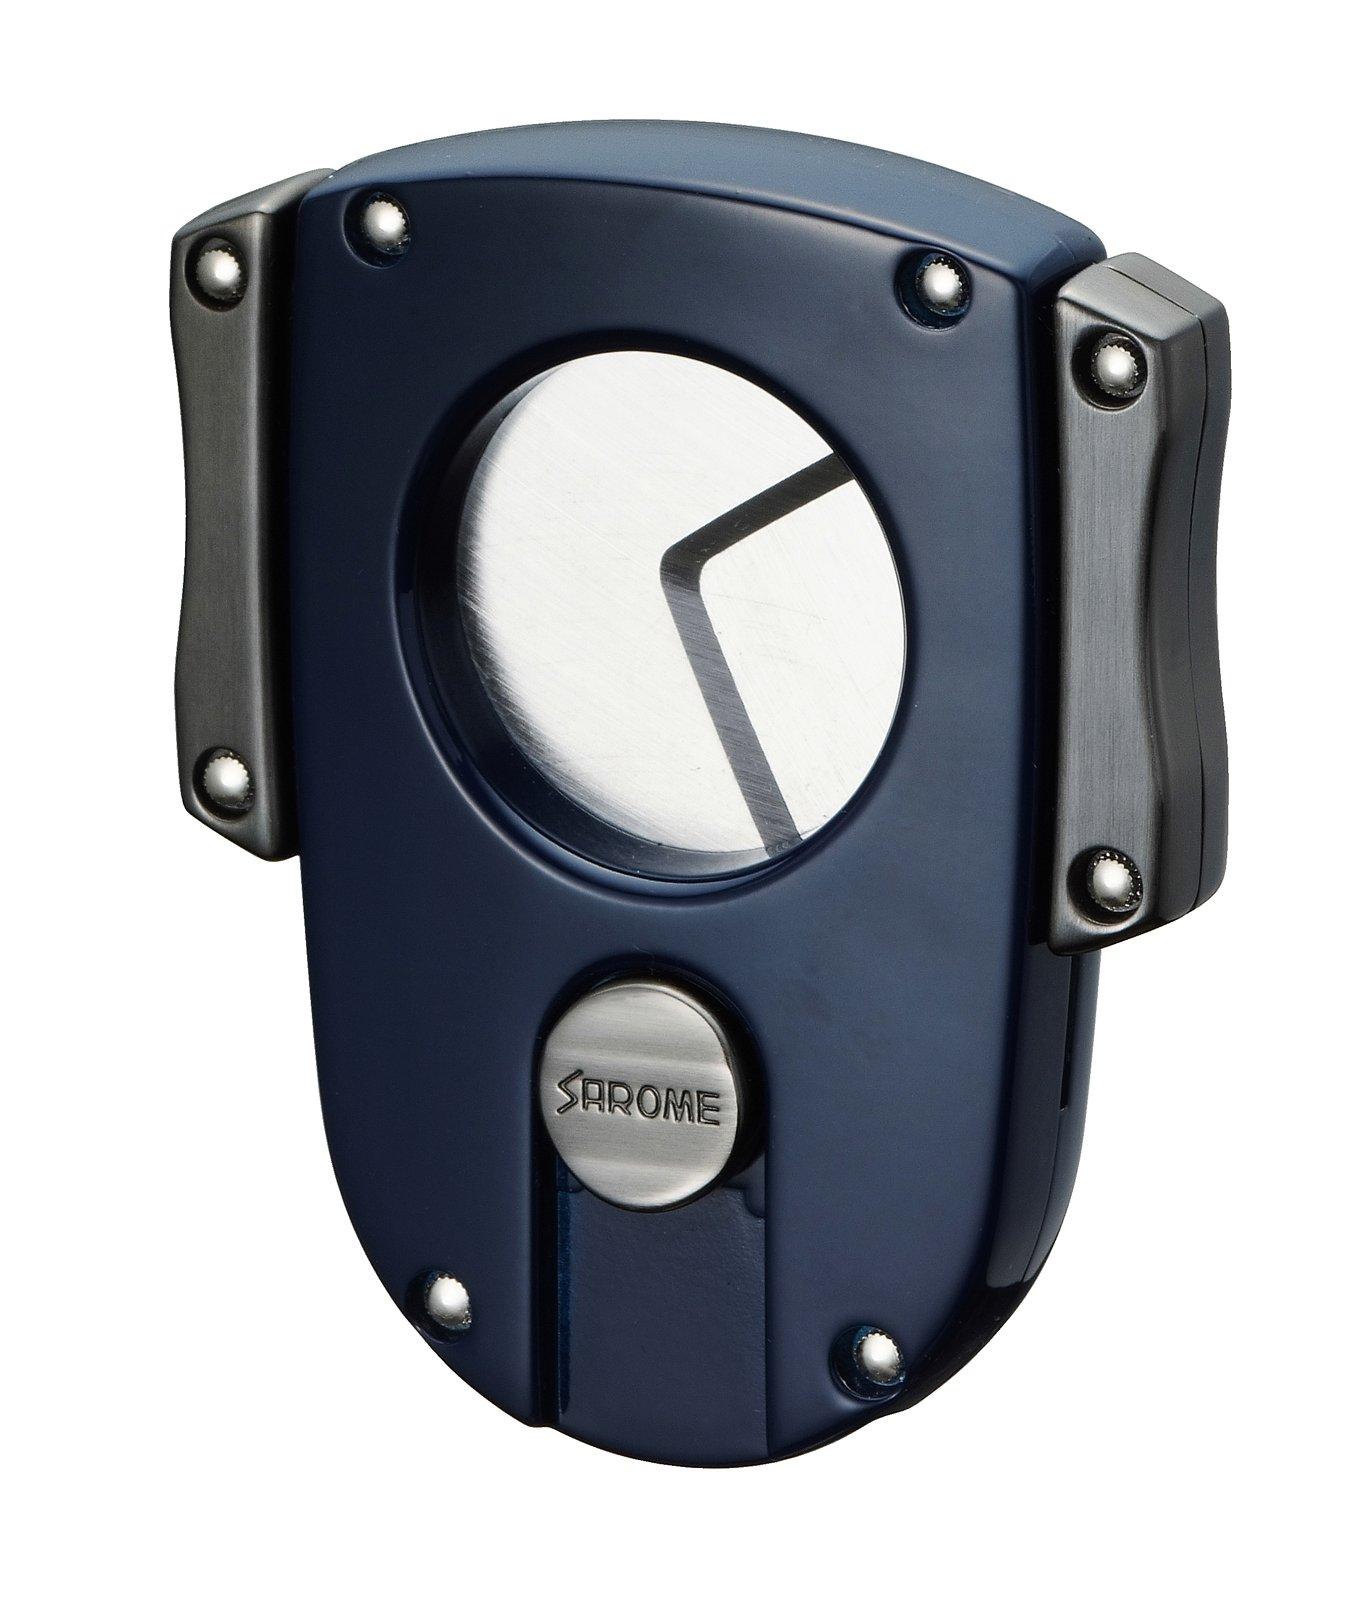 Sarome Metal Cigar Cutter EXCT2-03 Blue